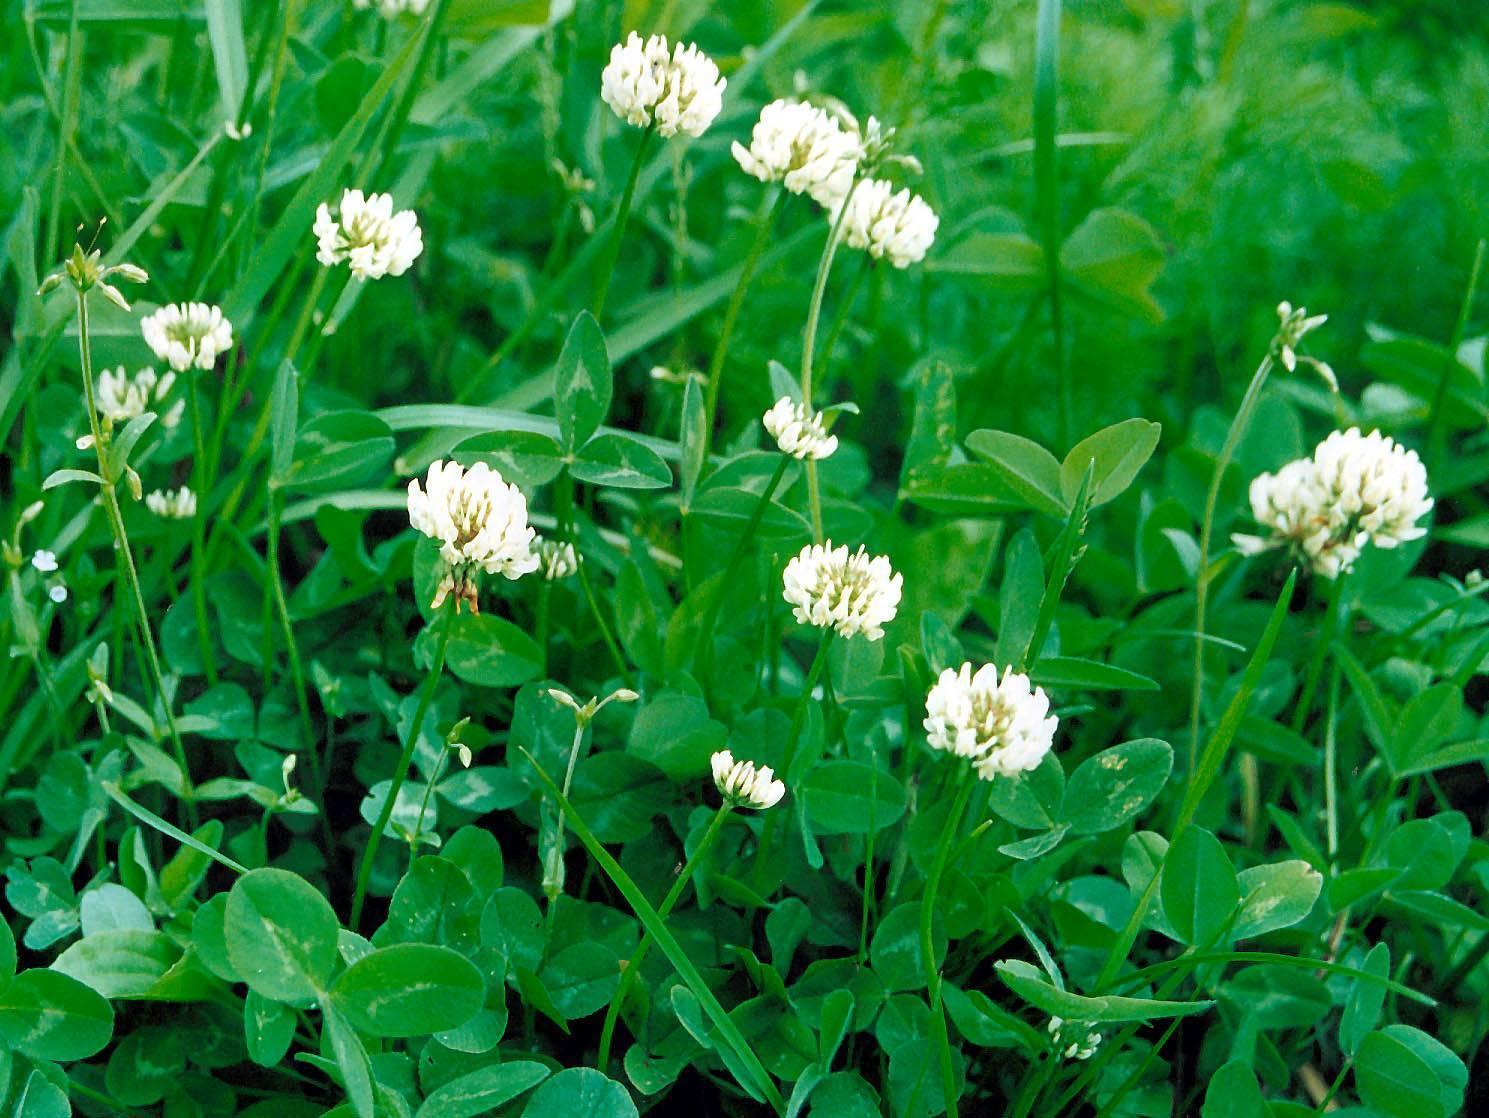 Клеверный газон: плюсы и минусы